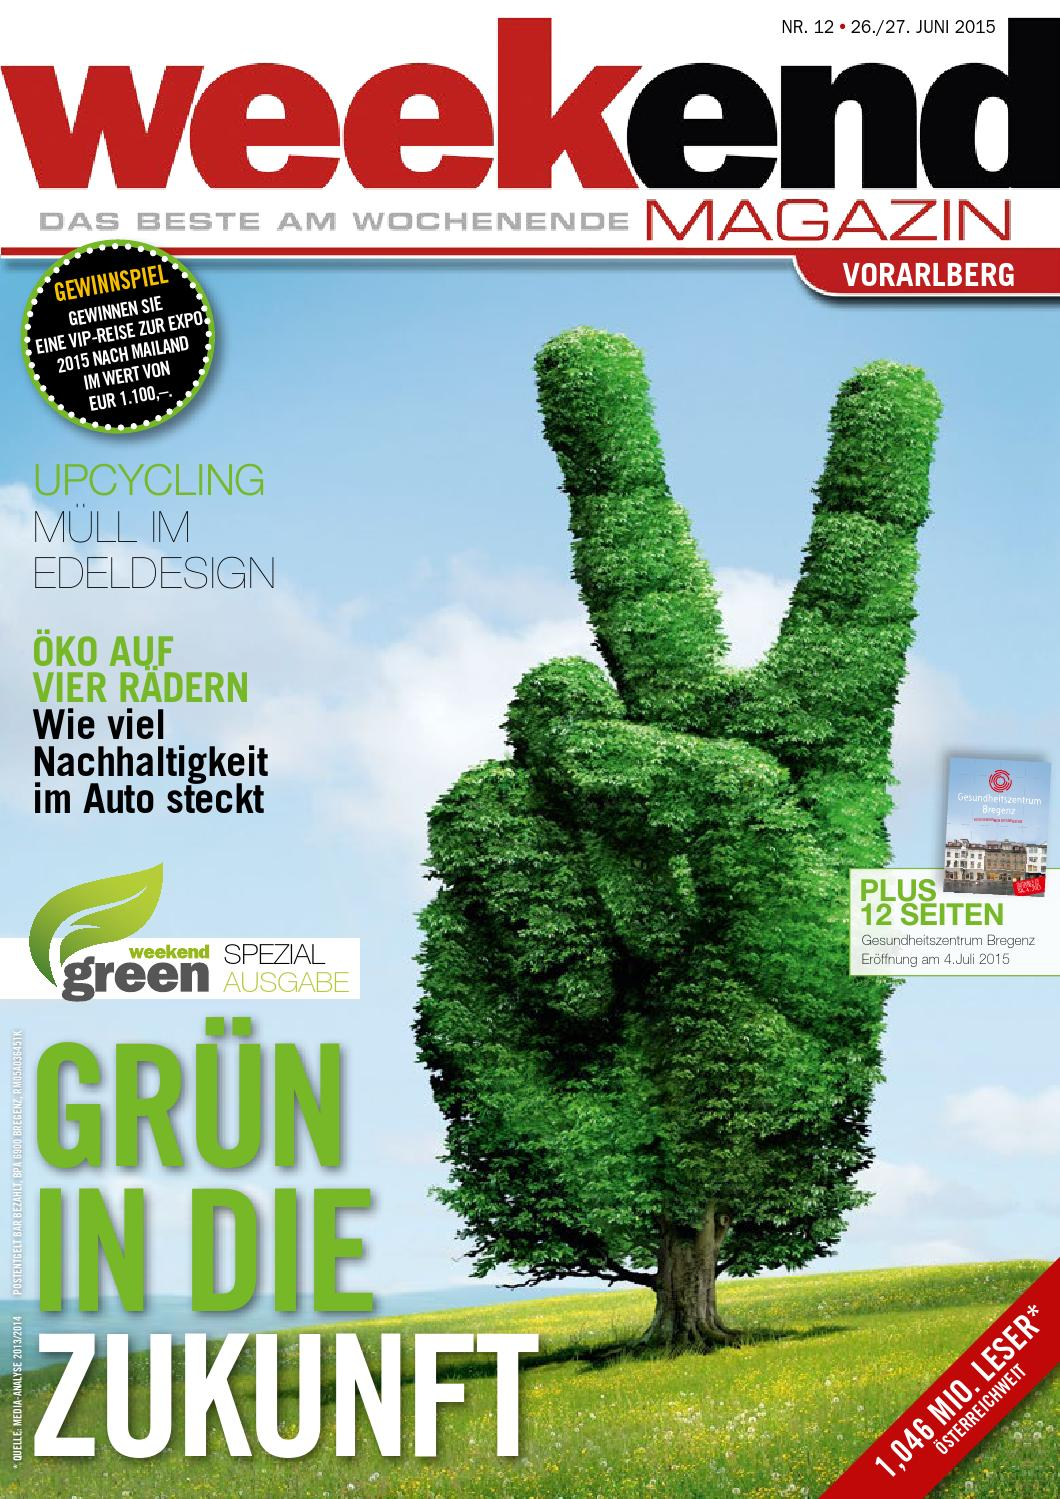 Weekend Magazin Vorarlberg 2015 KW 26 by Weekend Magazin Vorarlberg ...